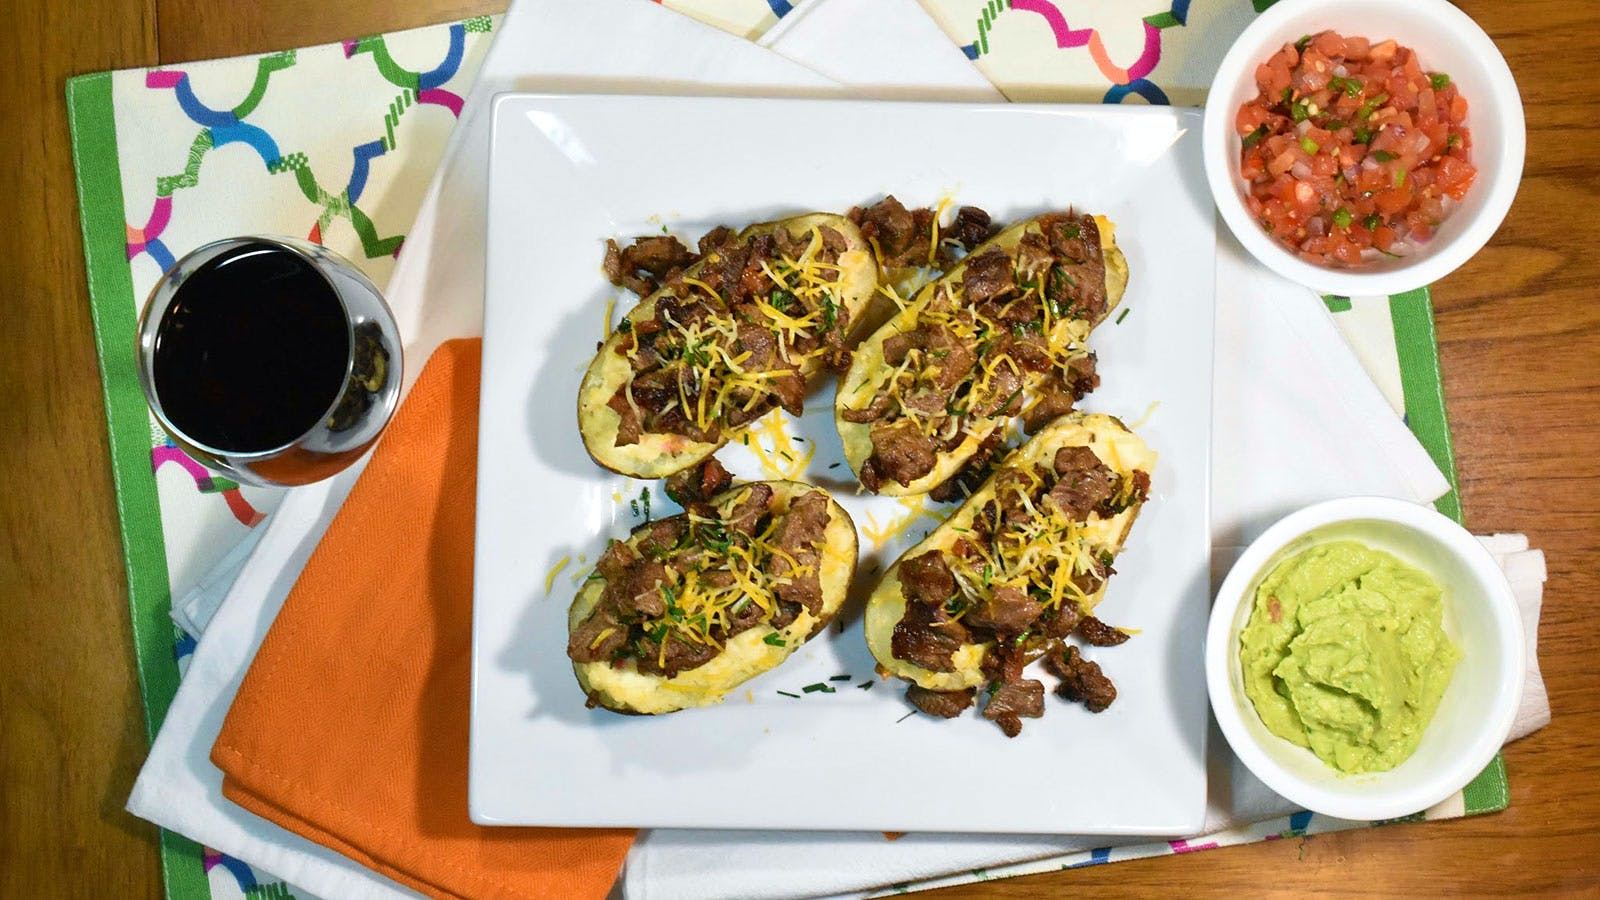 8 & $20: Steak-Loaded Cheesy Baked Potatoes